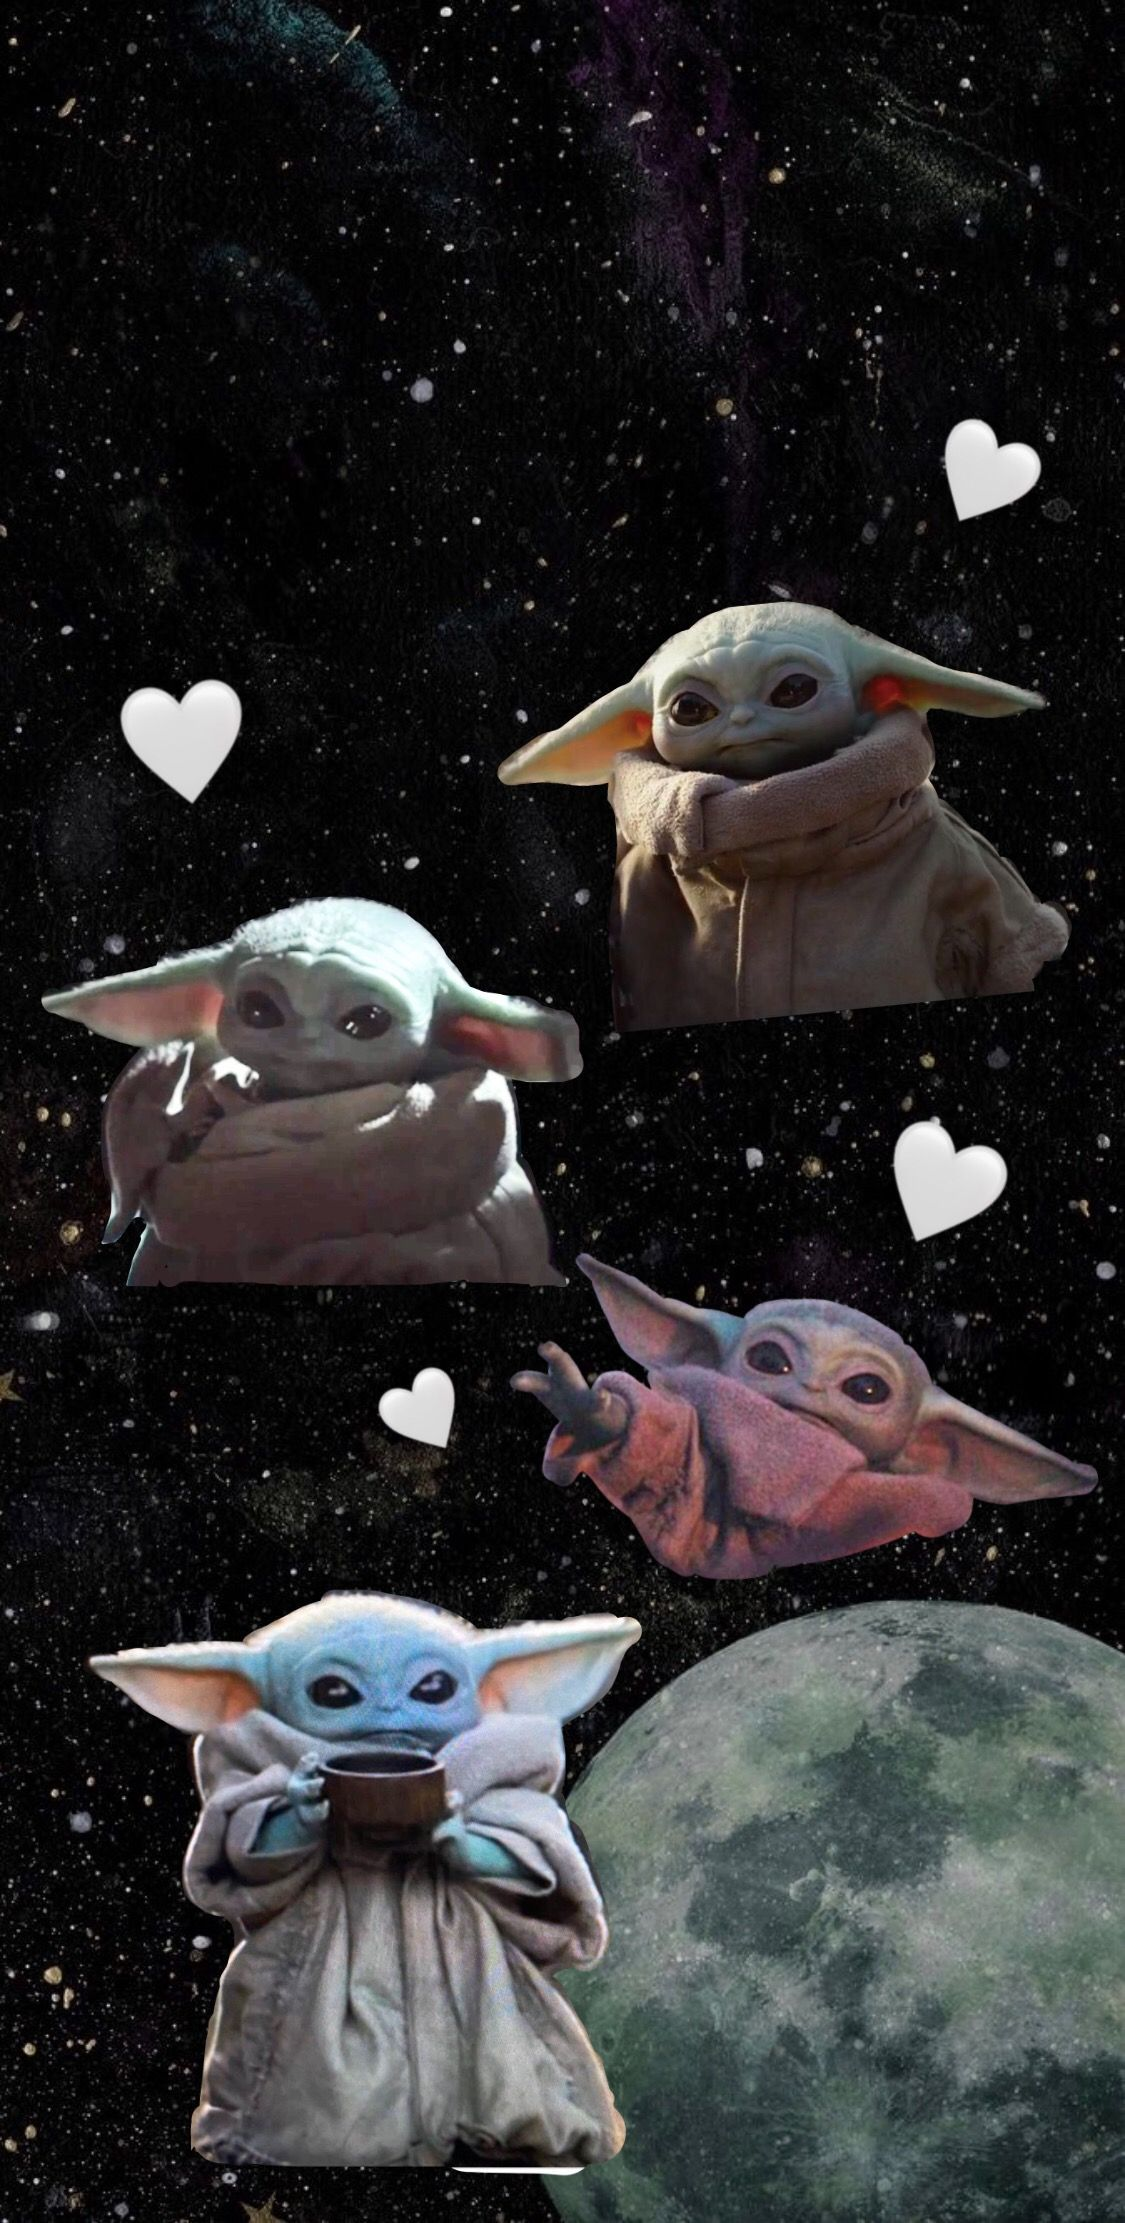 Baby Yoda 2020 Disney Cizimleri Illustrasyon Posterleri Yildiz Savaslari